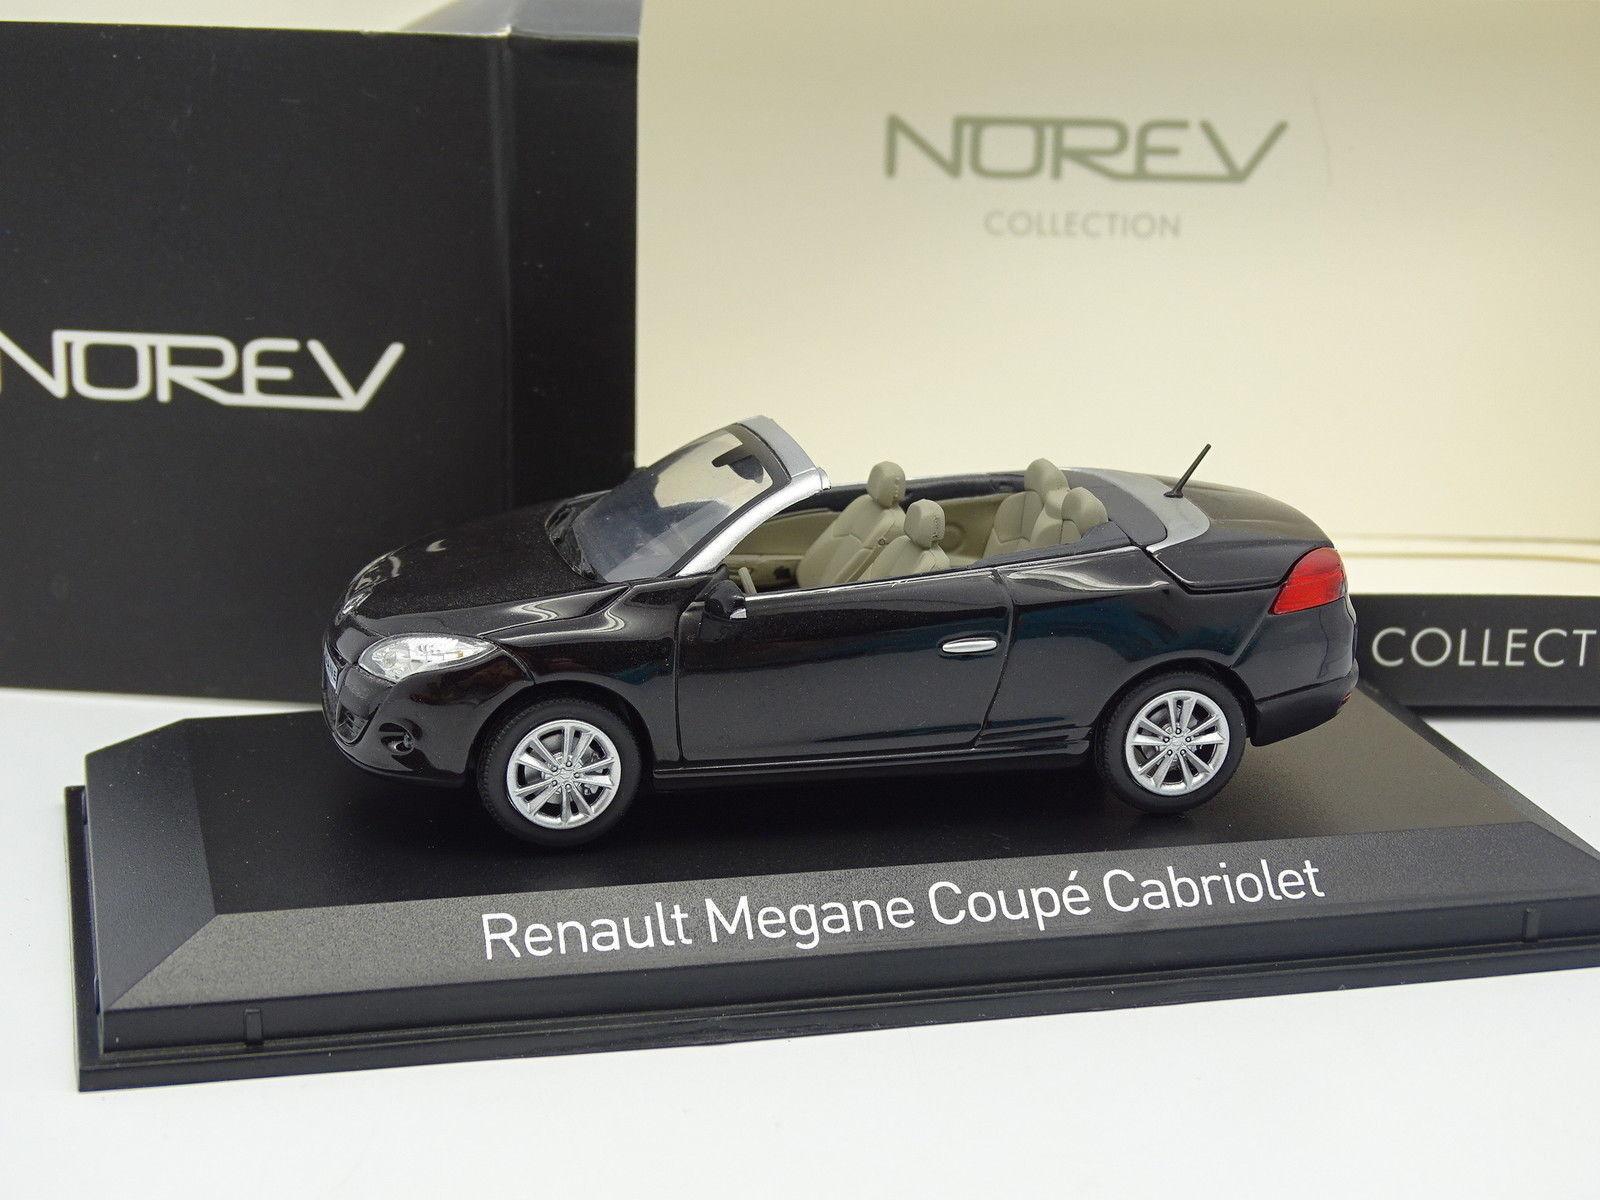 Norev 1/43 - Renault Megane CC neroe 2010